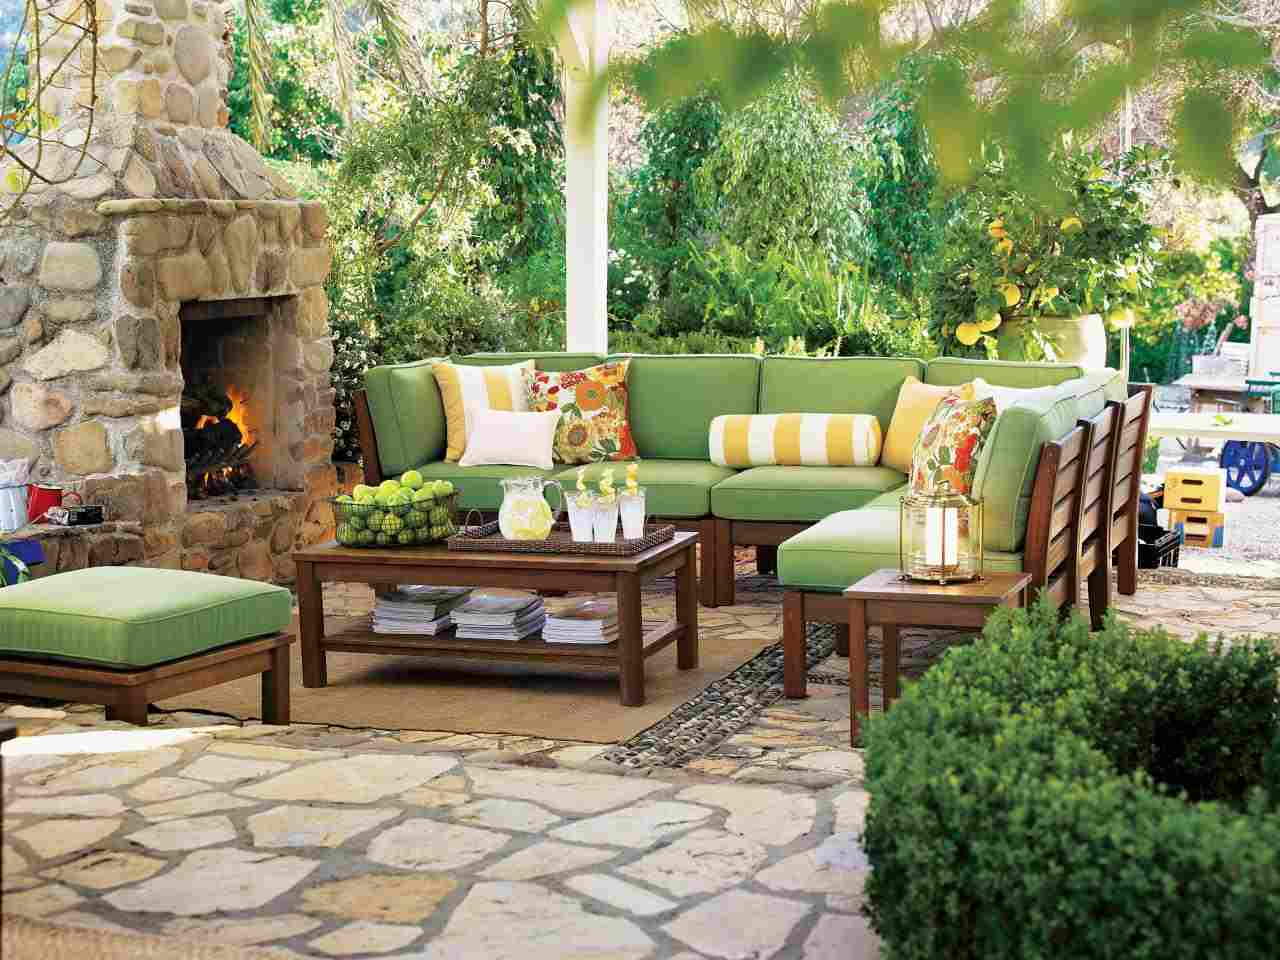 iluminar-jardin-moderno-farolas-chimenea-muebles-madera